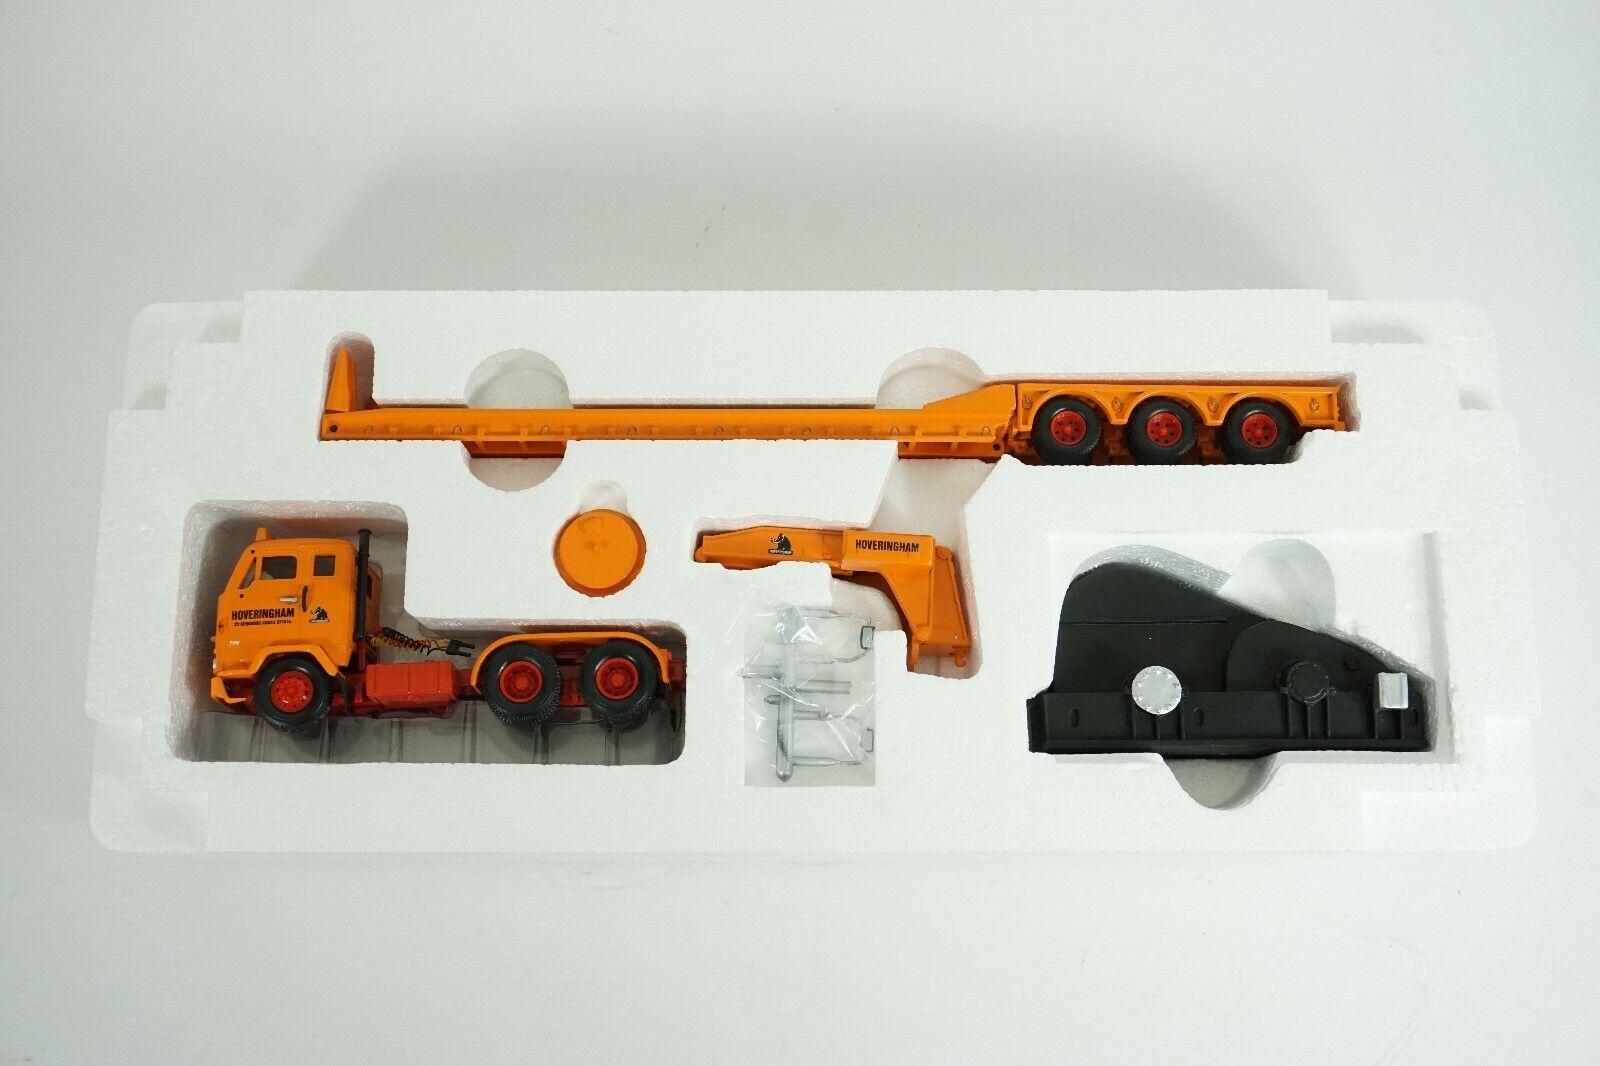 Corgi Heavy Haulage 1 50 Volvo F88 3 Axle Low Loader & Load item CC13104 NEW